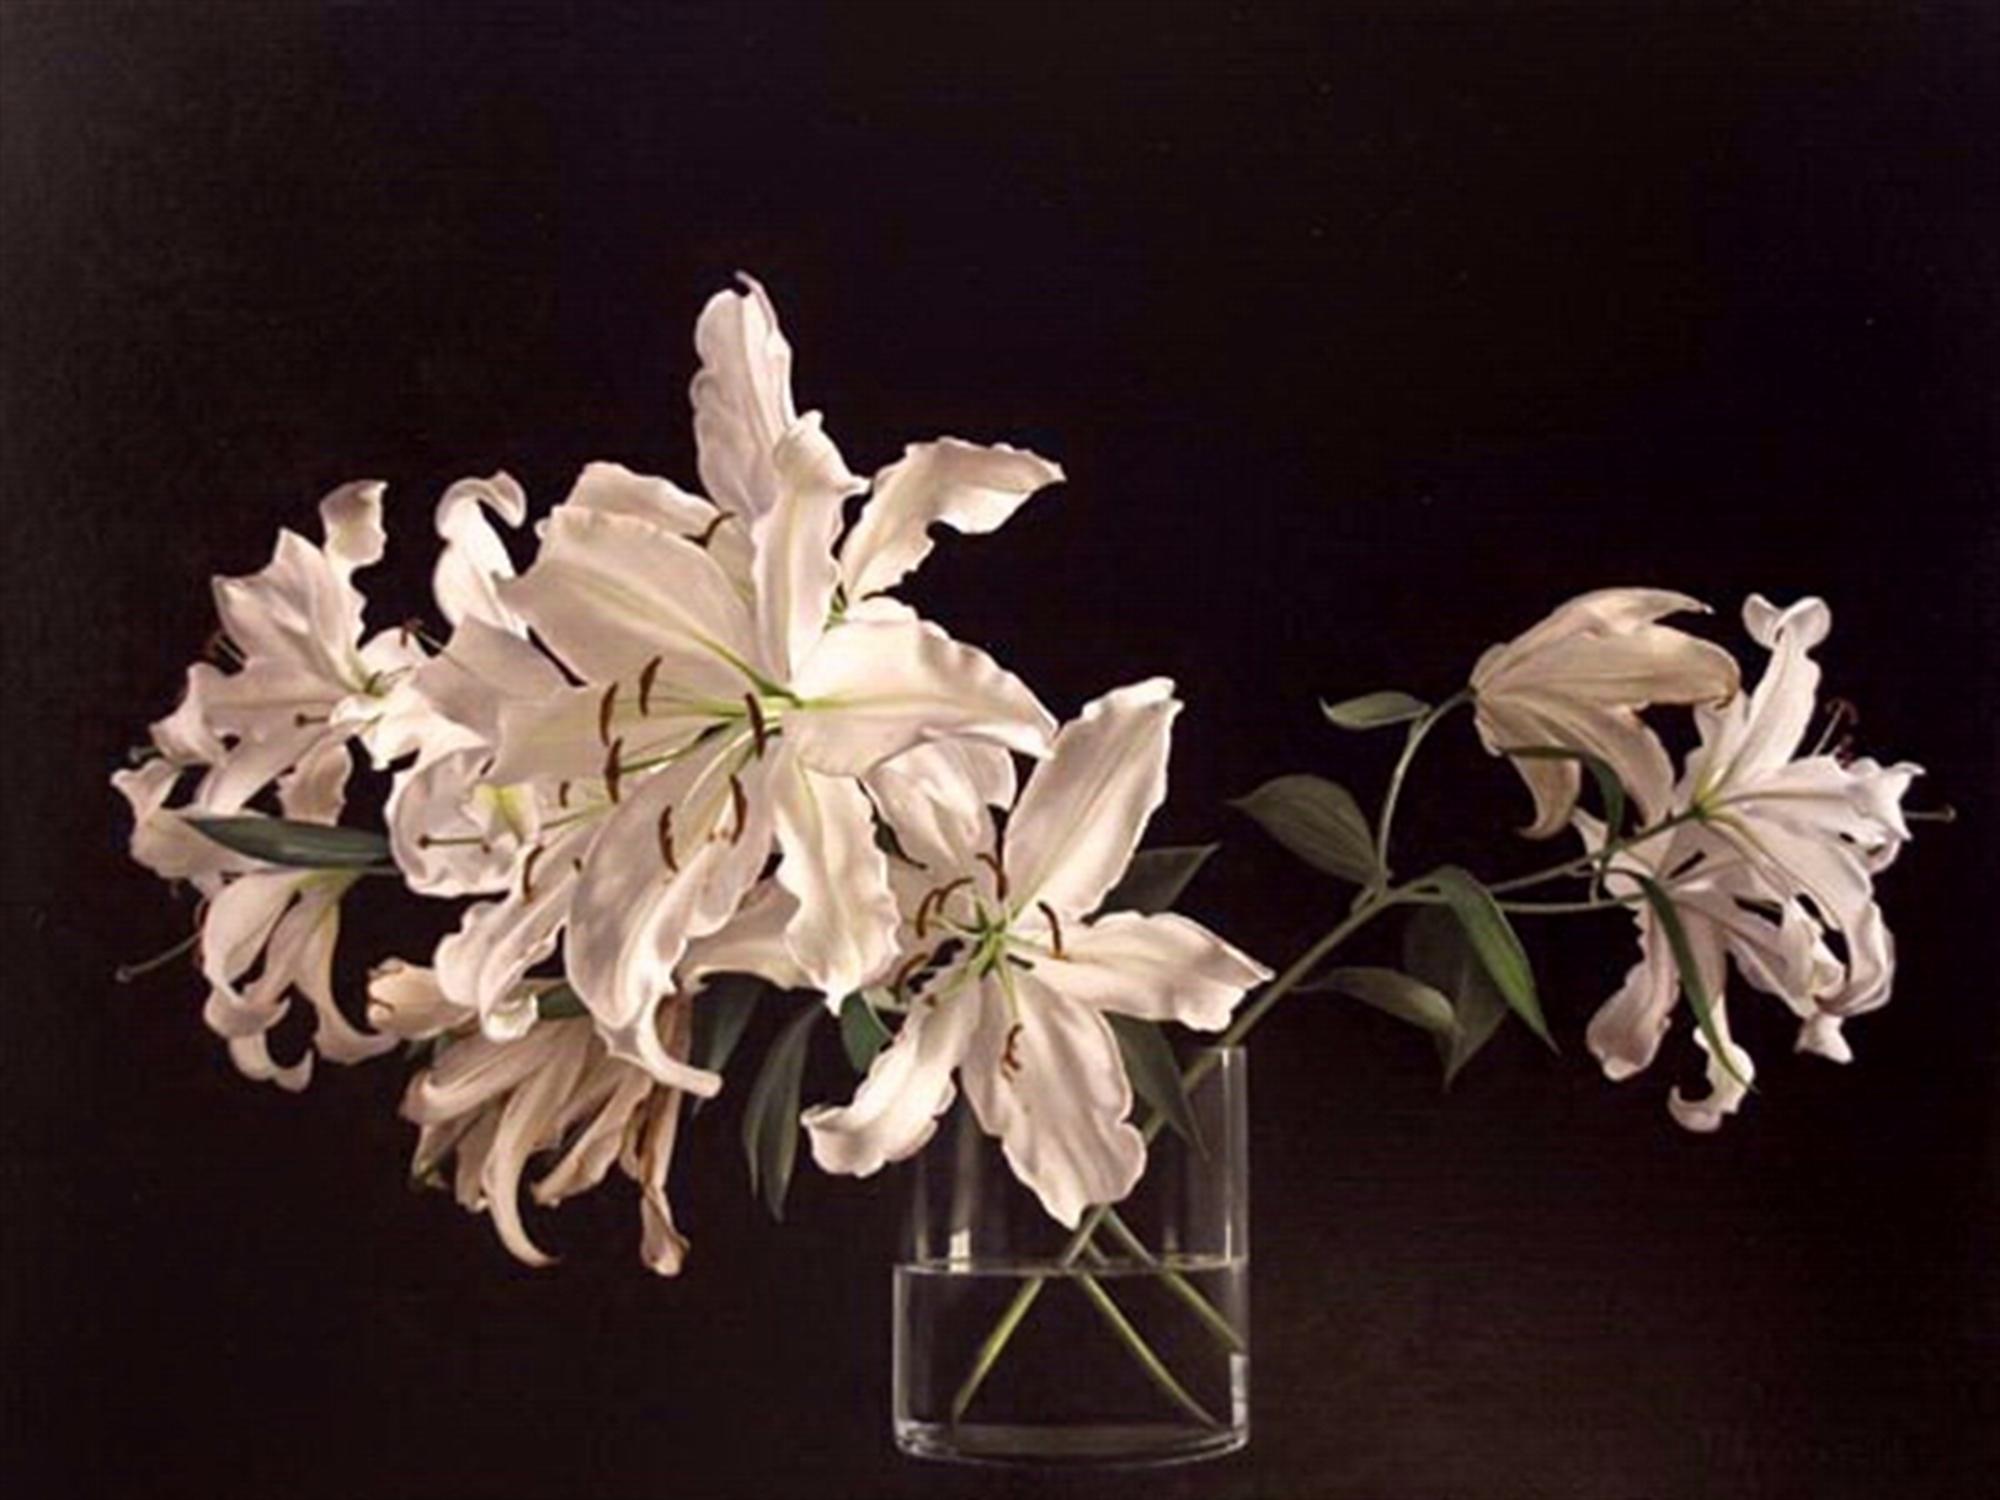 Lilies on Black by Tatyana Klevenskiy